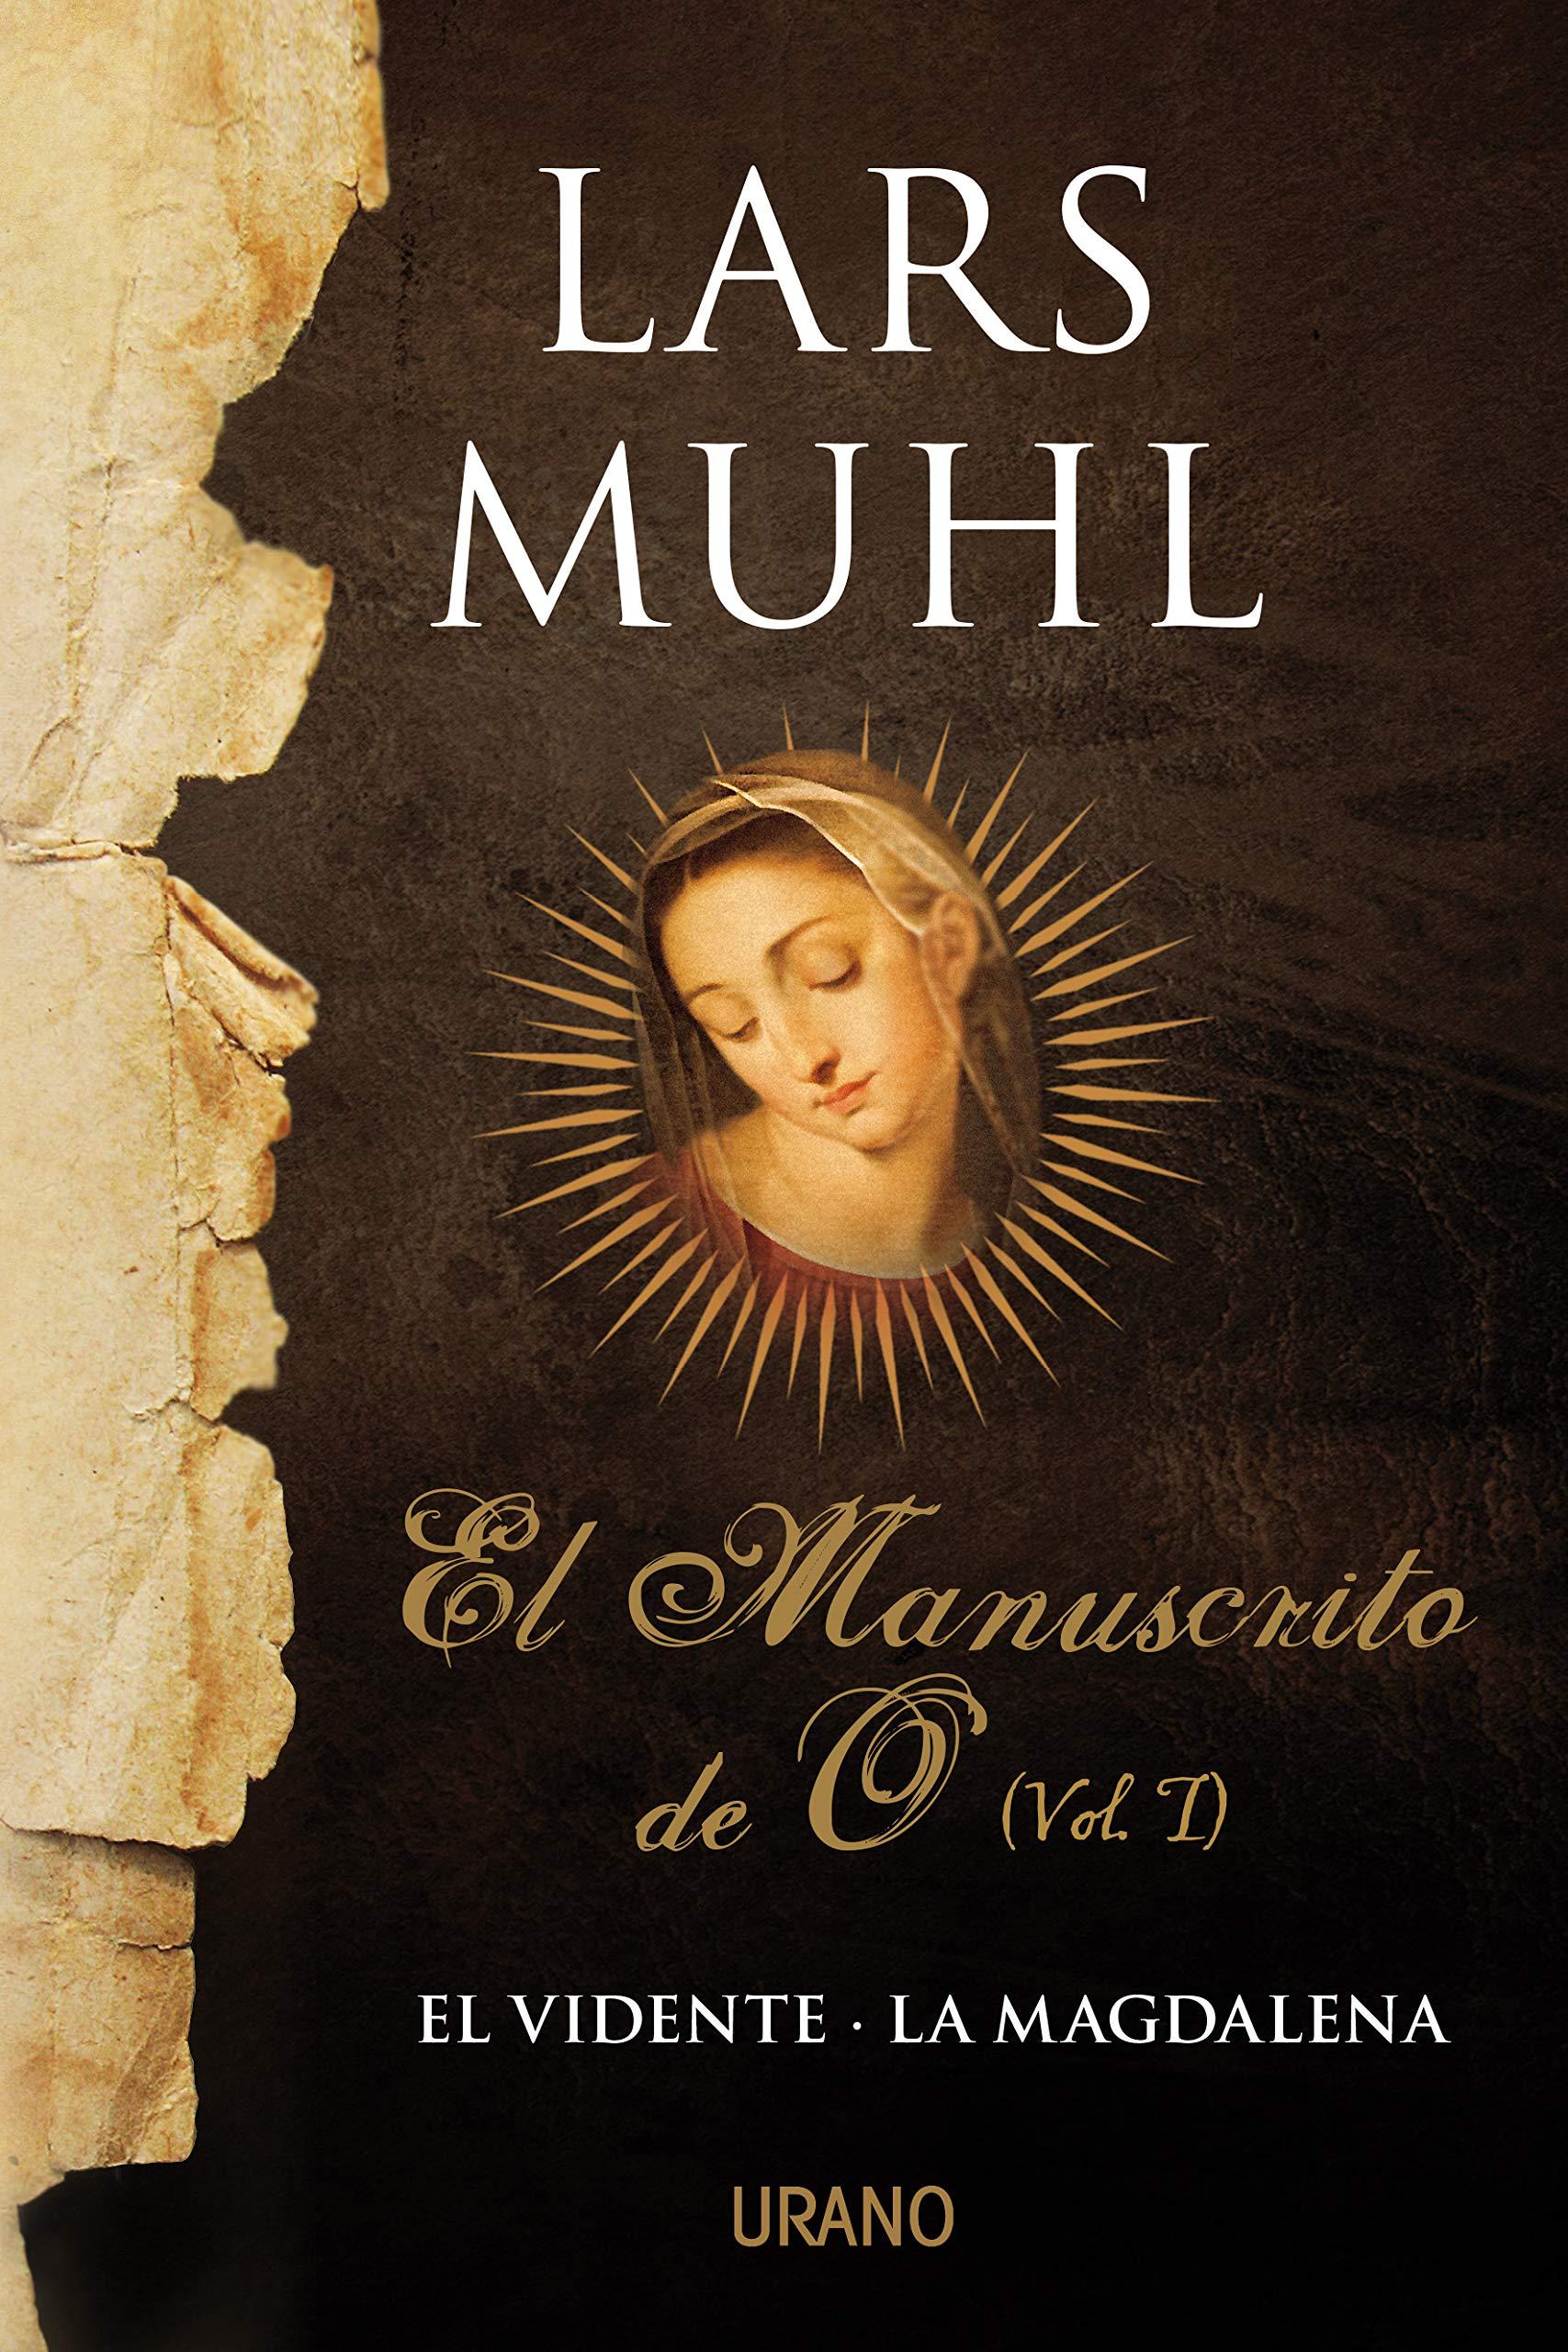 El manuscrito de O: El vidente- La magdalena Crecimiento personal:  Amazon.es: Lars Muhl, Rosa Arruti Illarramendi, Victoria E. Horrillo  Ledesma: Libros